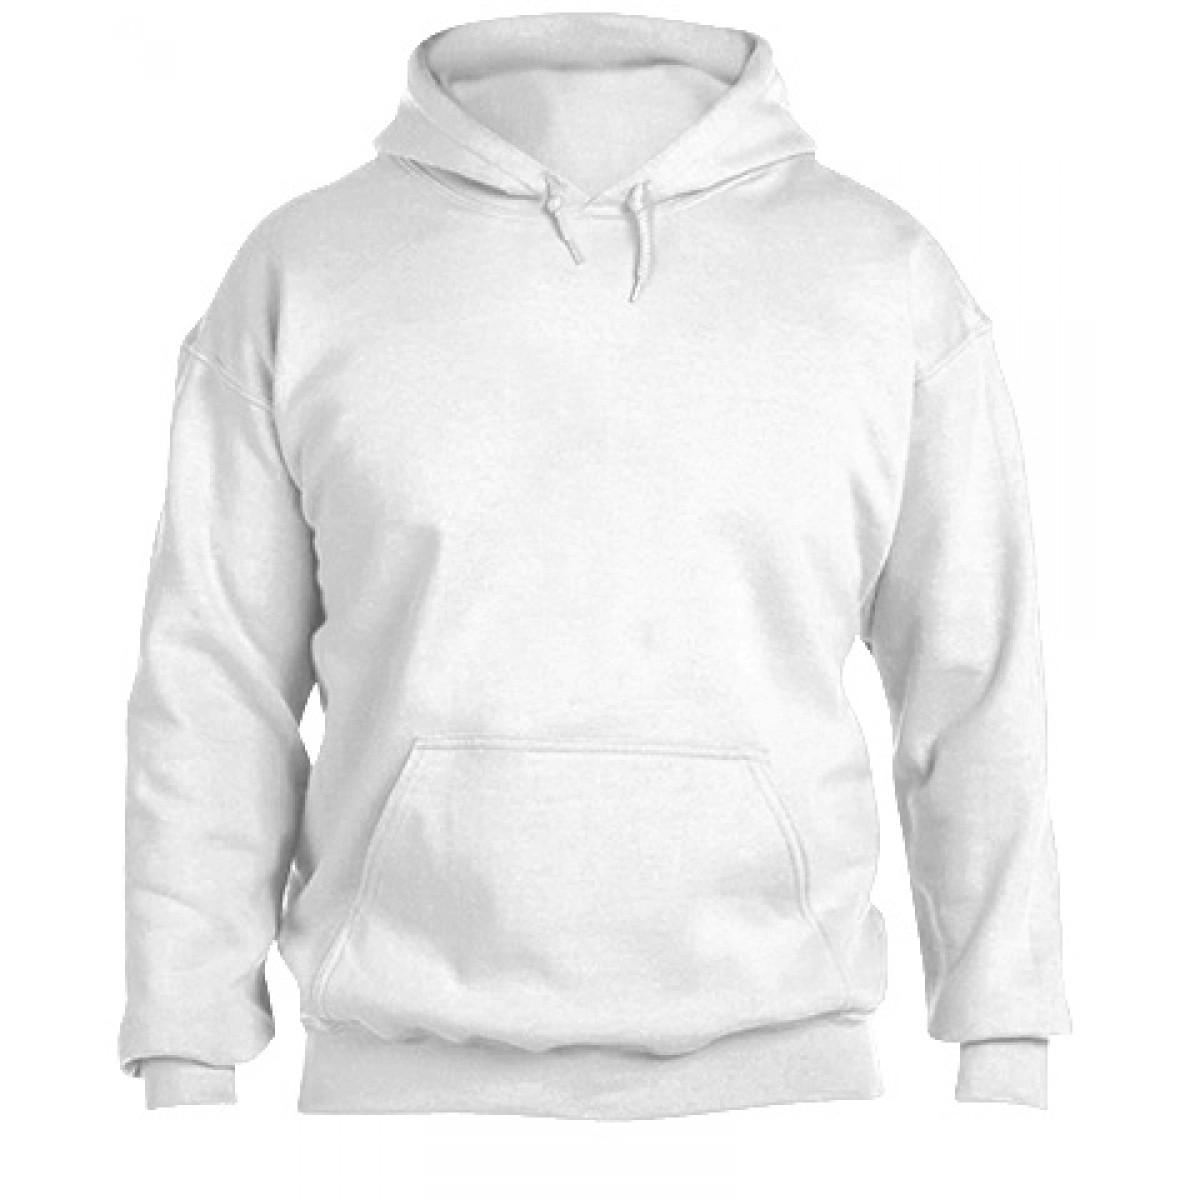 Hooded Sweatshirt 50/50 Heavy Blend-White-L